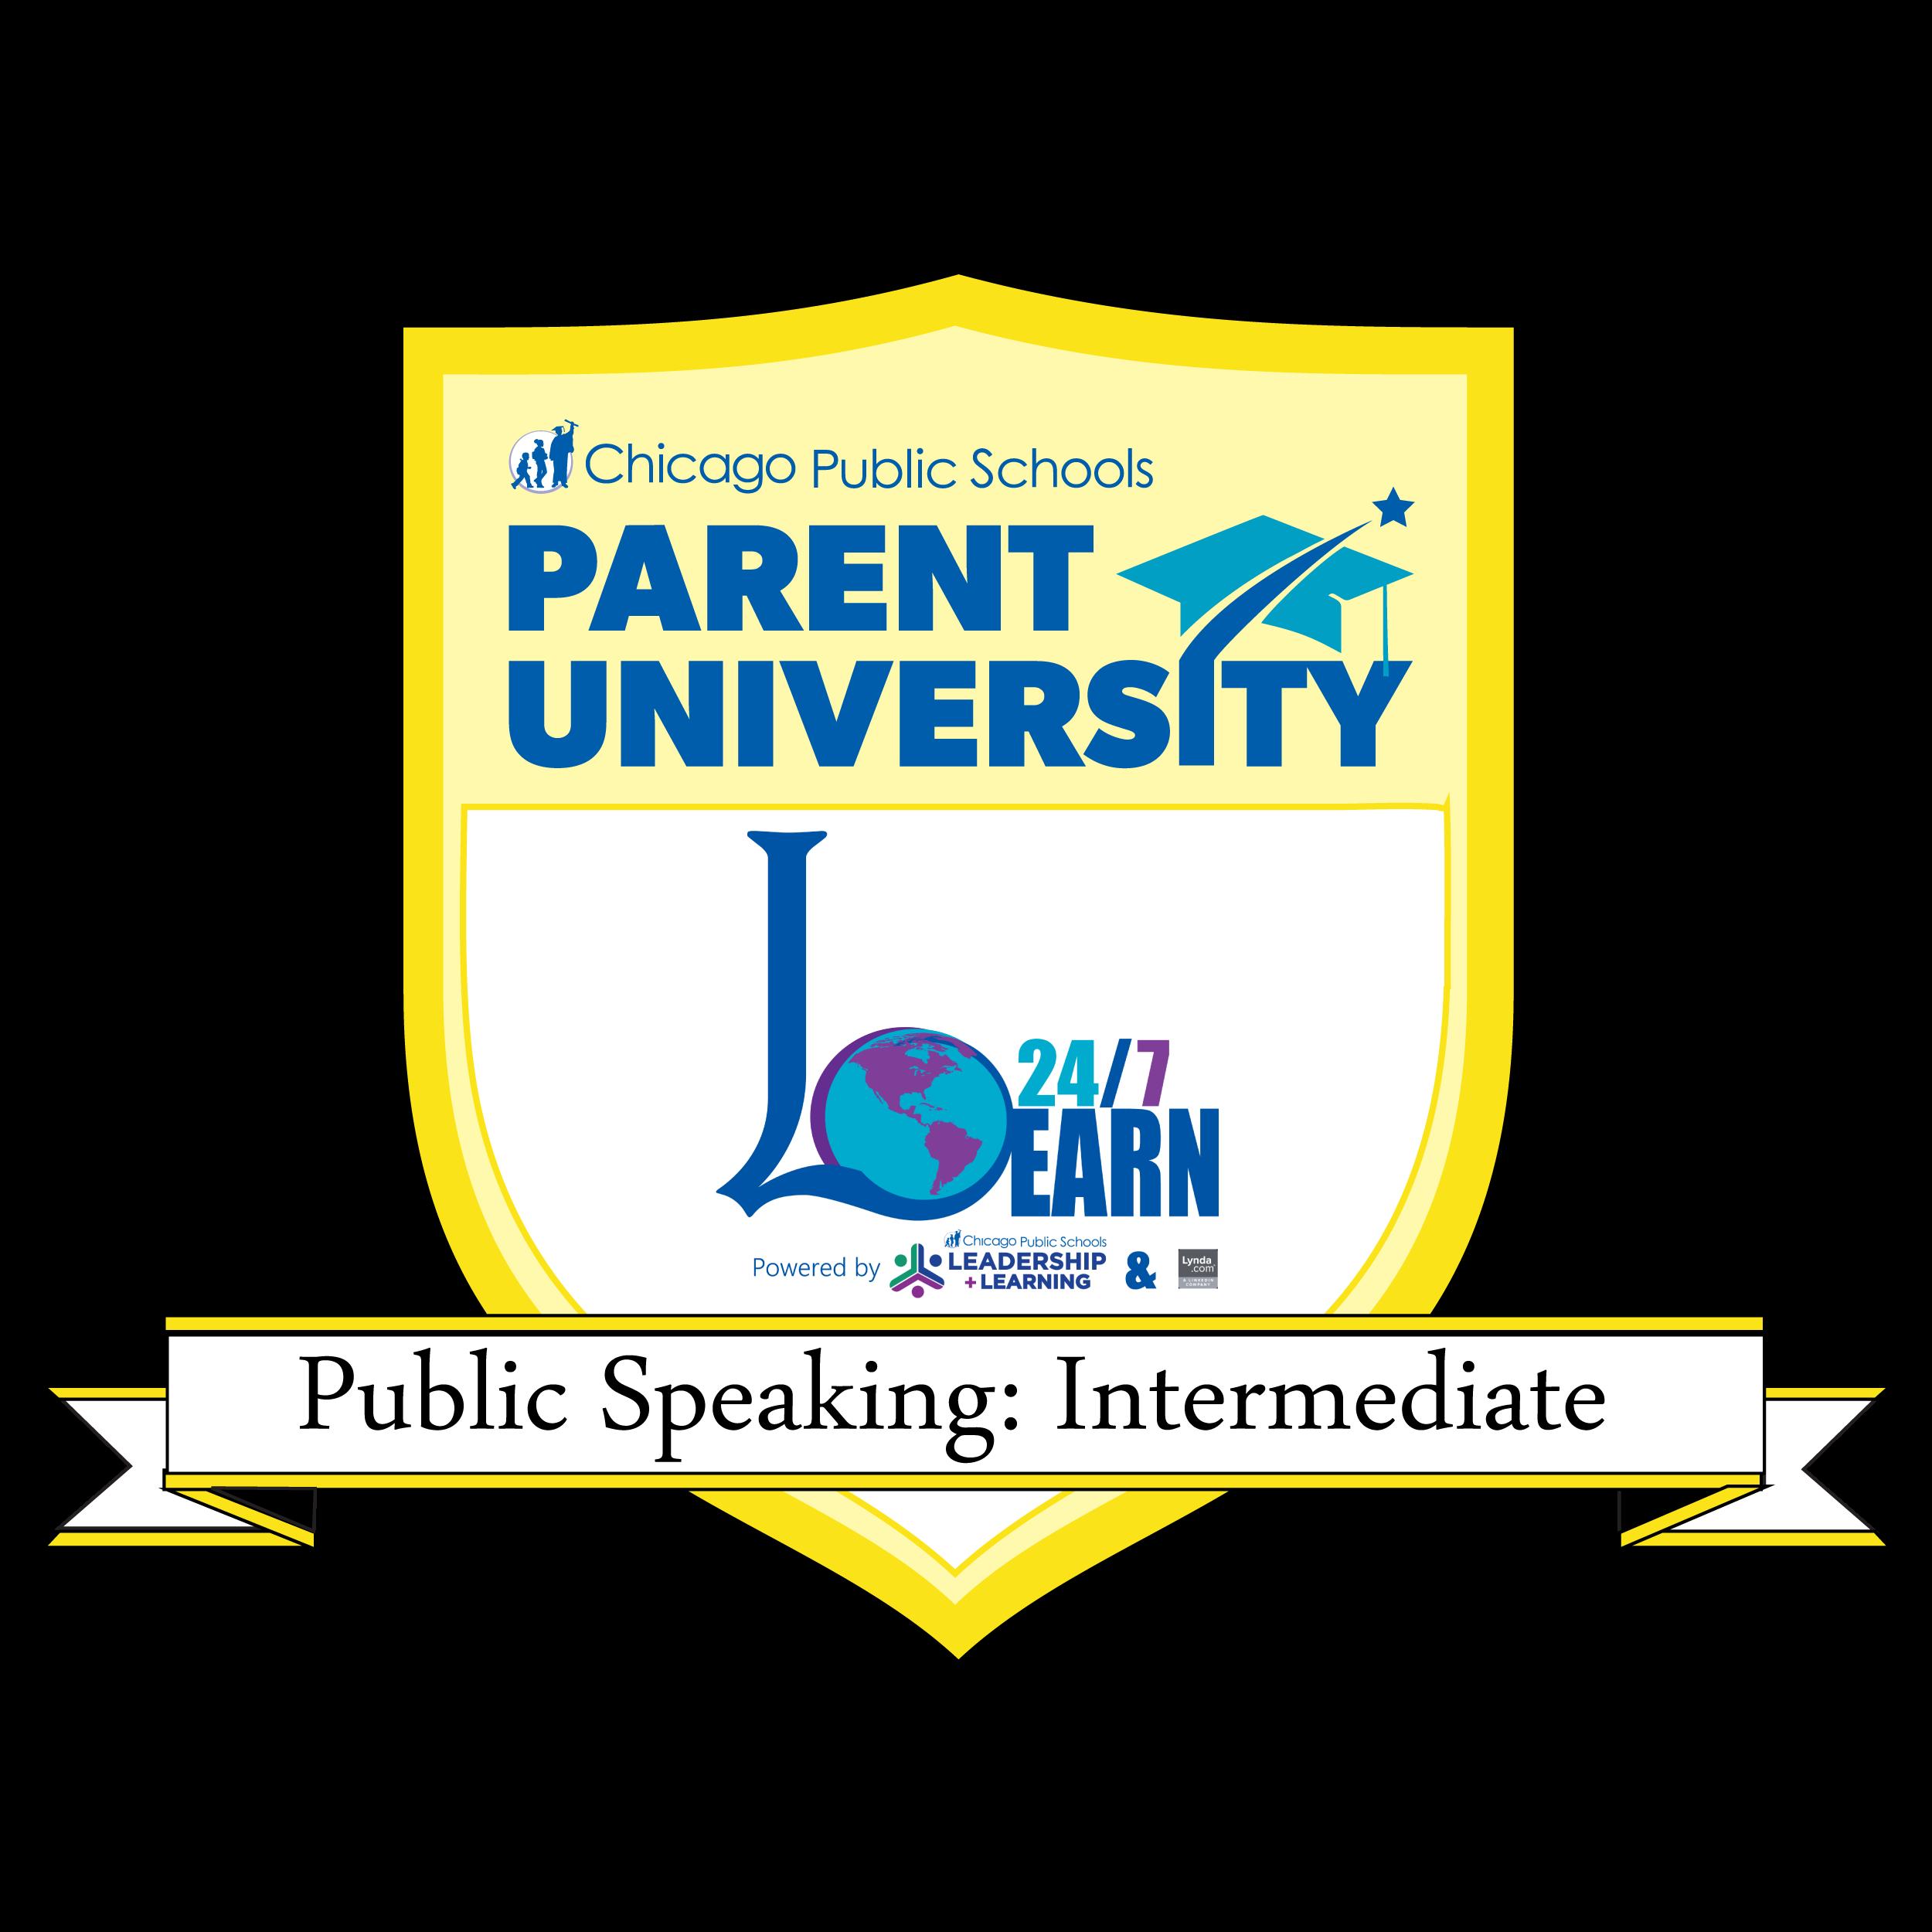 Public Speaking: Intermediate